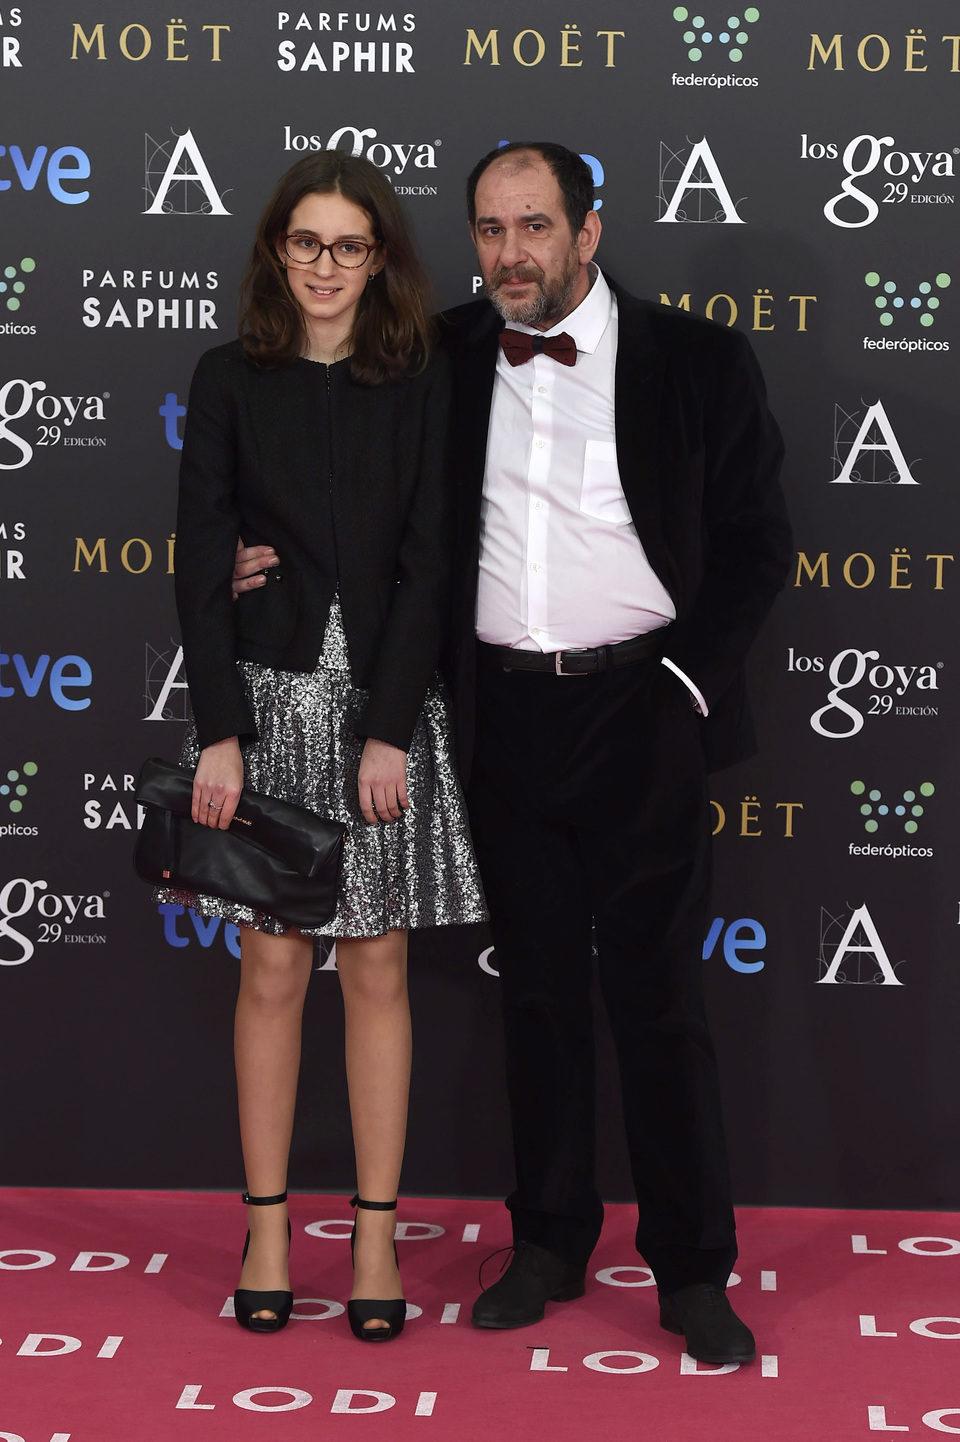 Karra Elejalde en la alfombra roja de los Goya 2015